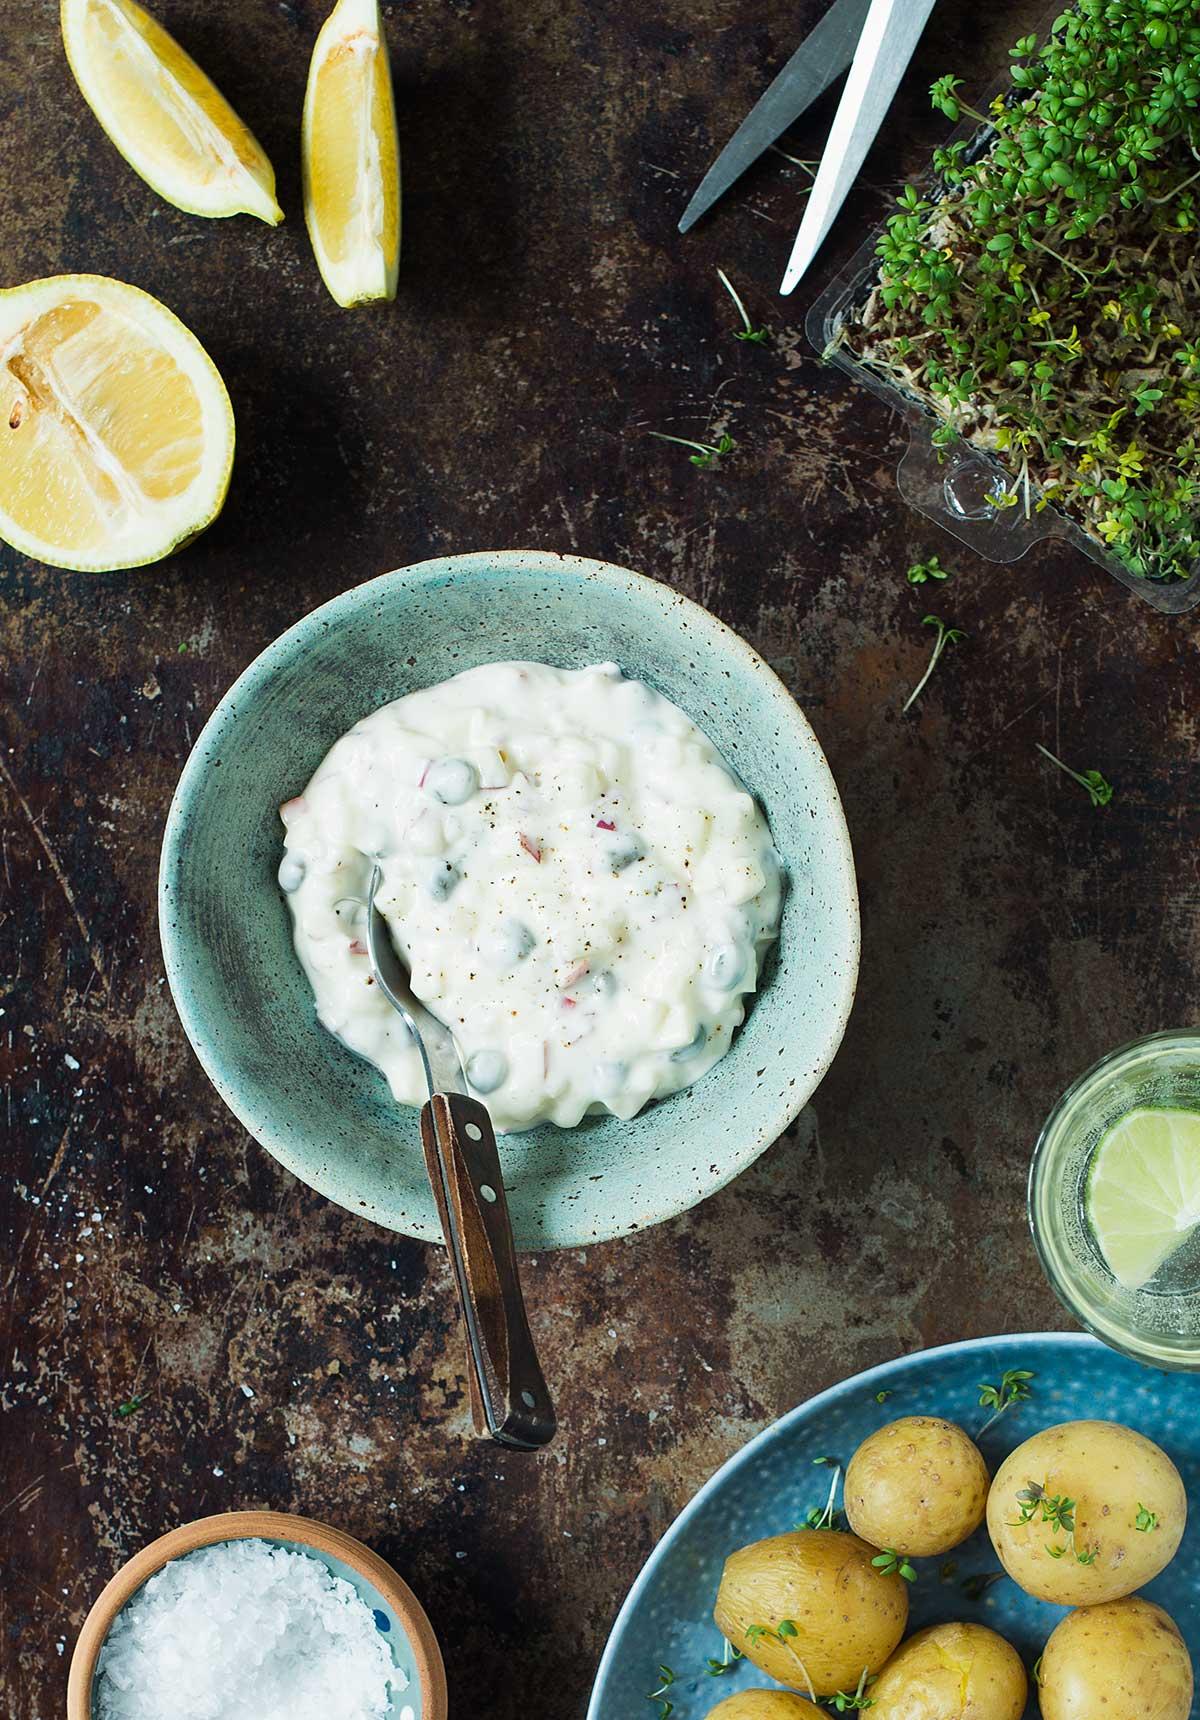 Recept: Remouladsås | Frk. Kräsen